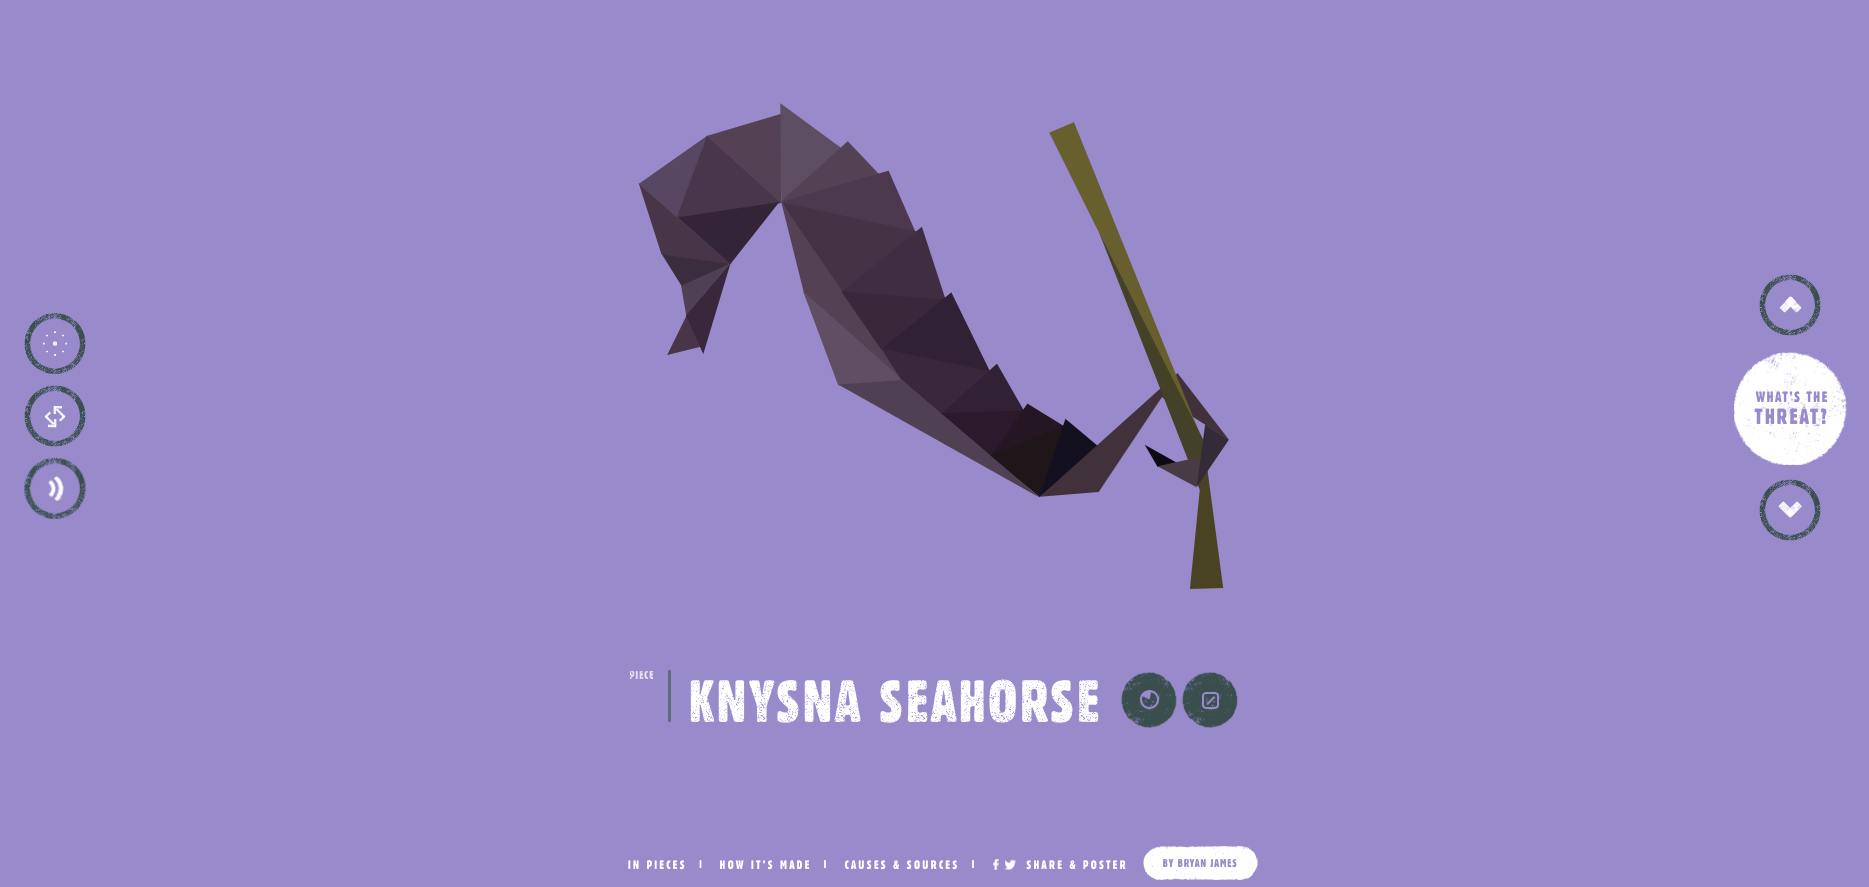 screenshot of Knysna Seahorse website